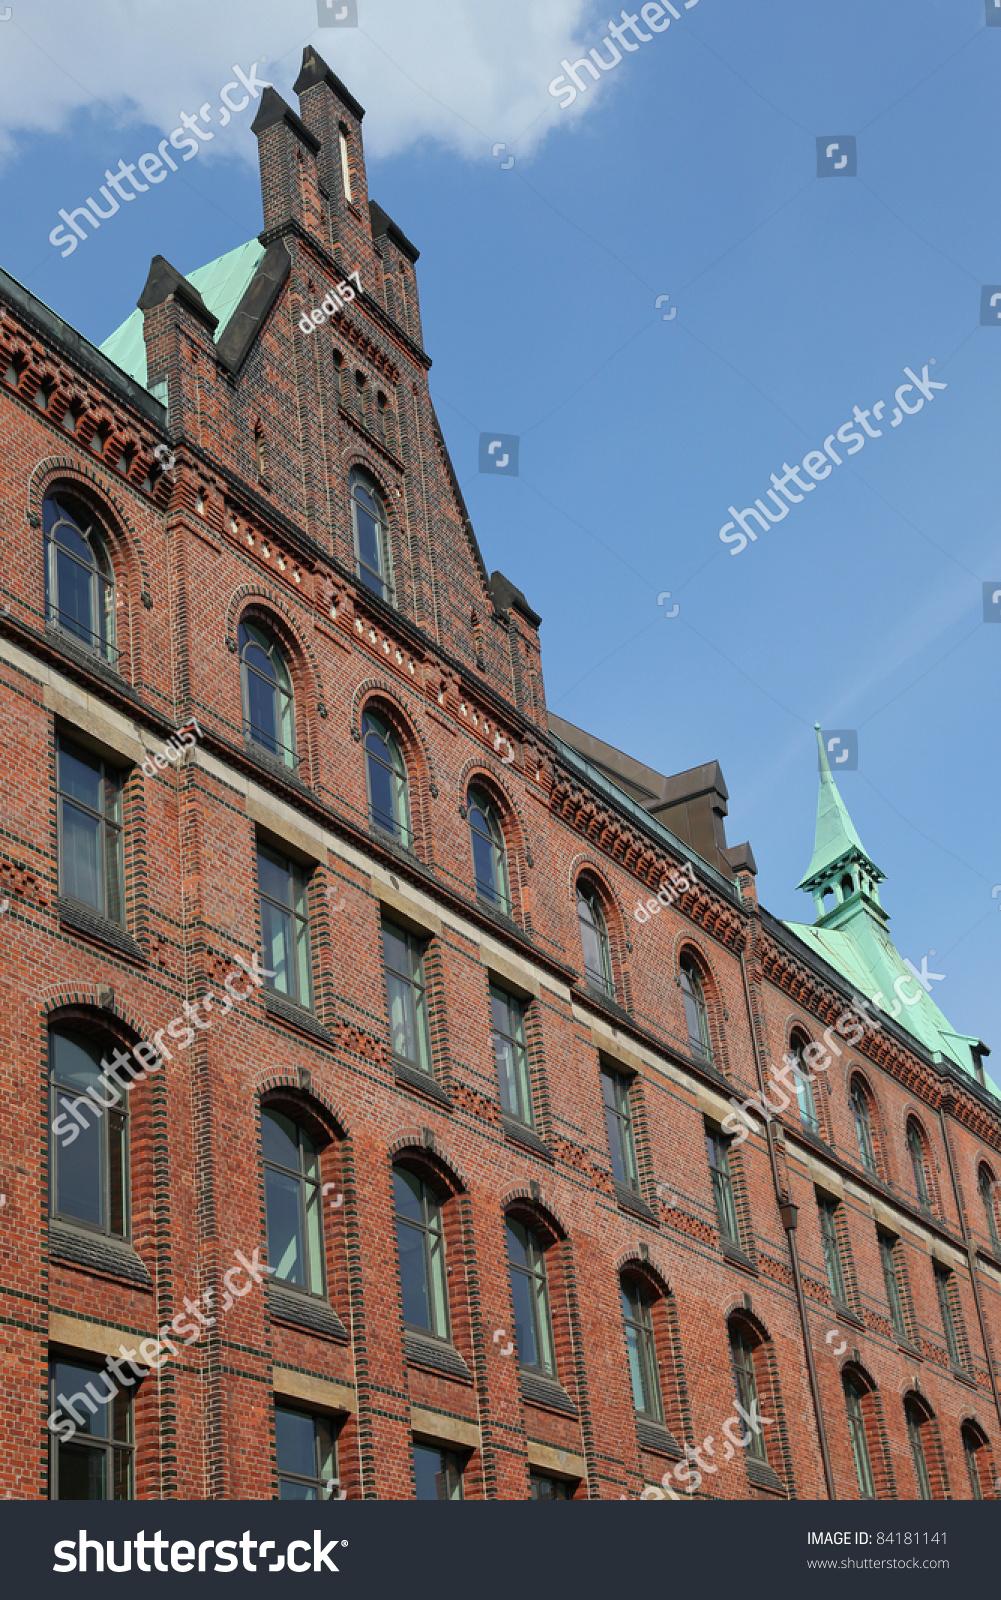 facade old building speicherstadt hamburg germany stock. Black Bedroom Furniture Sets. Home Design Ideas